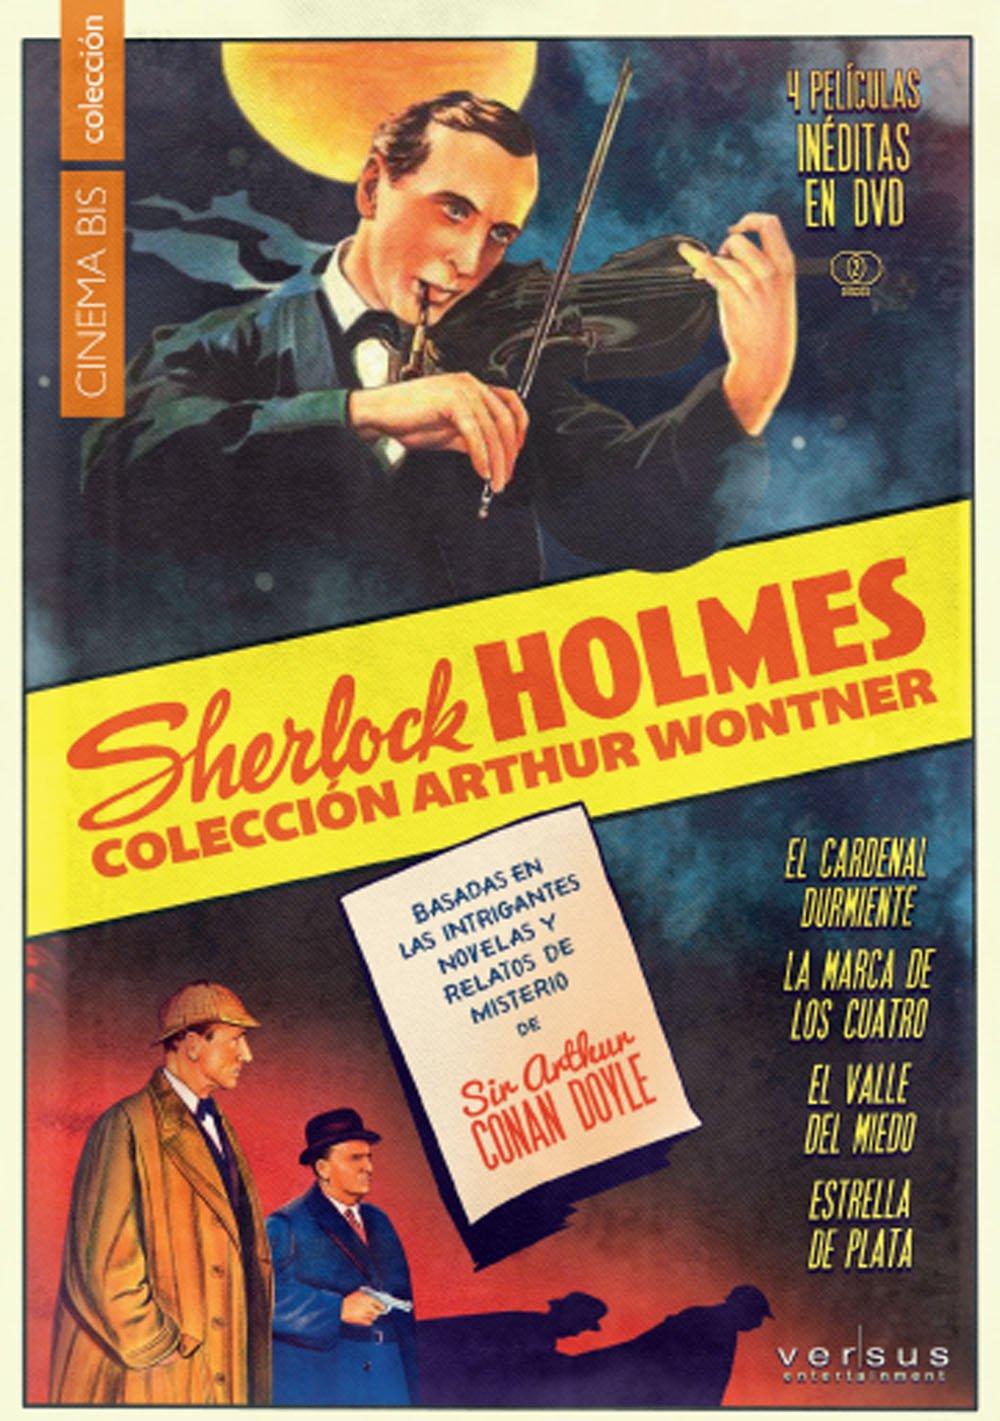 Arthur Wontner as Sherlock Holmes